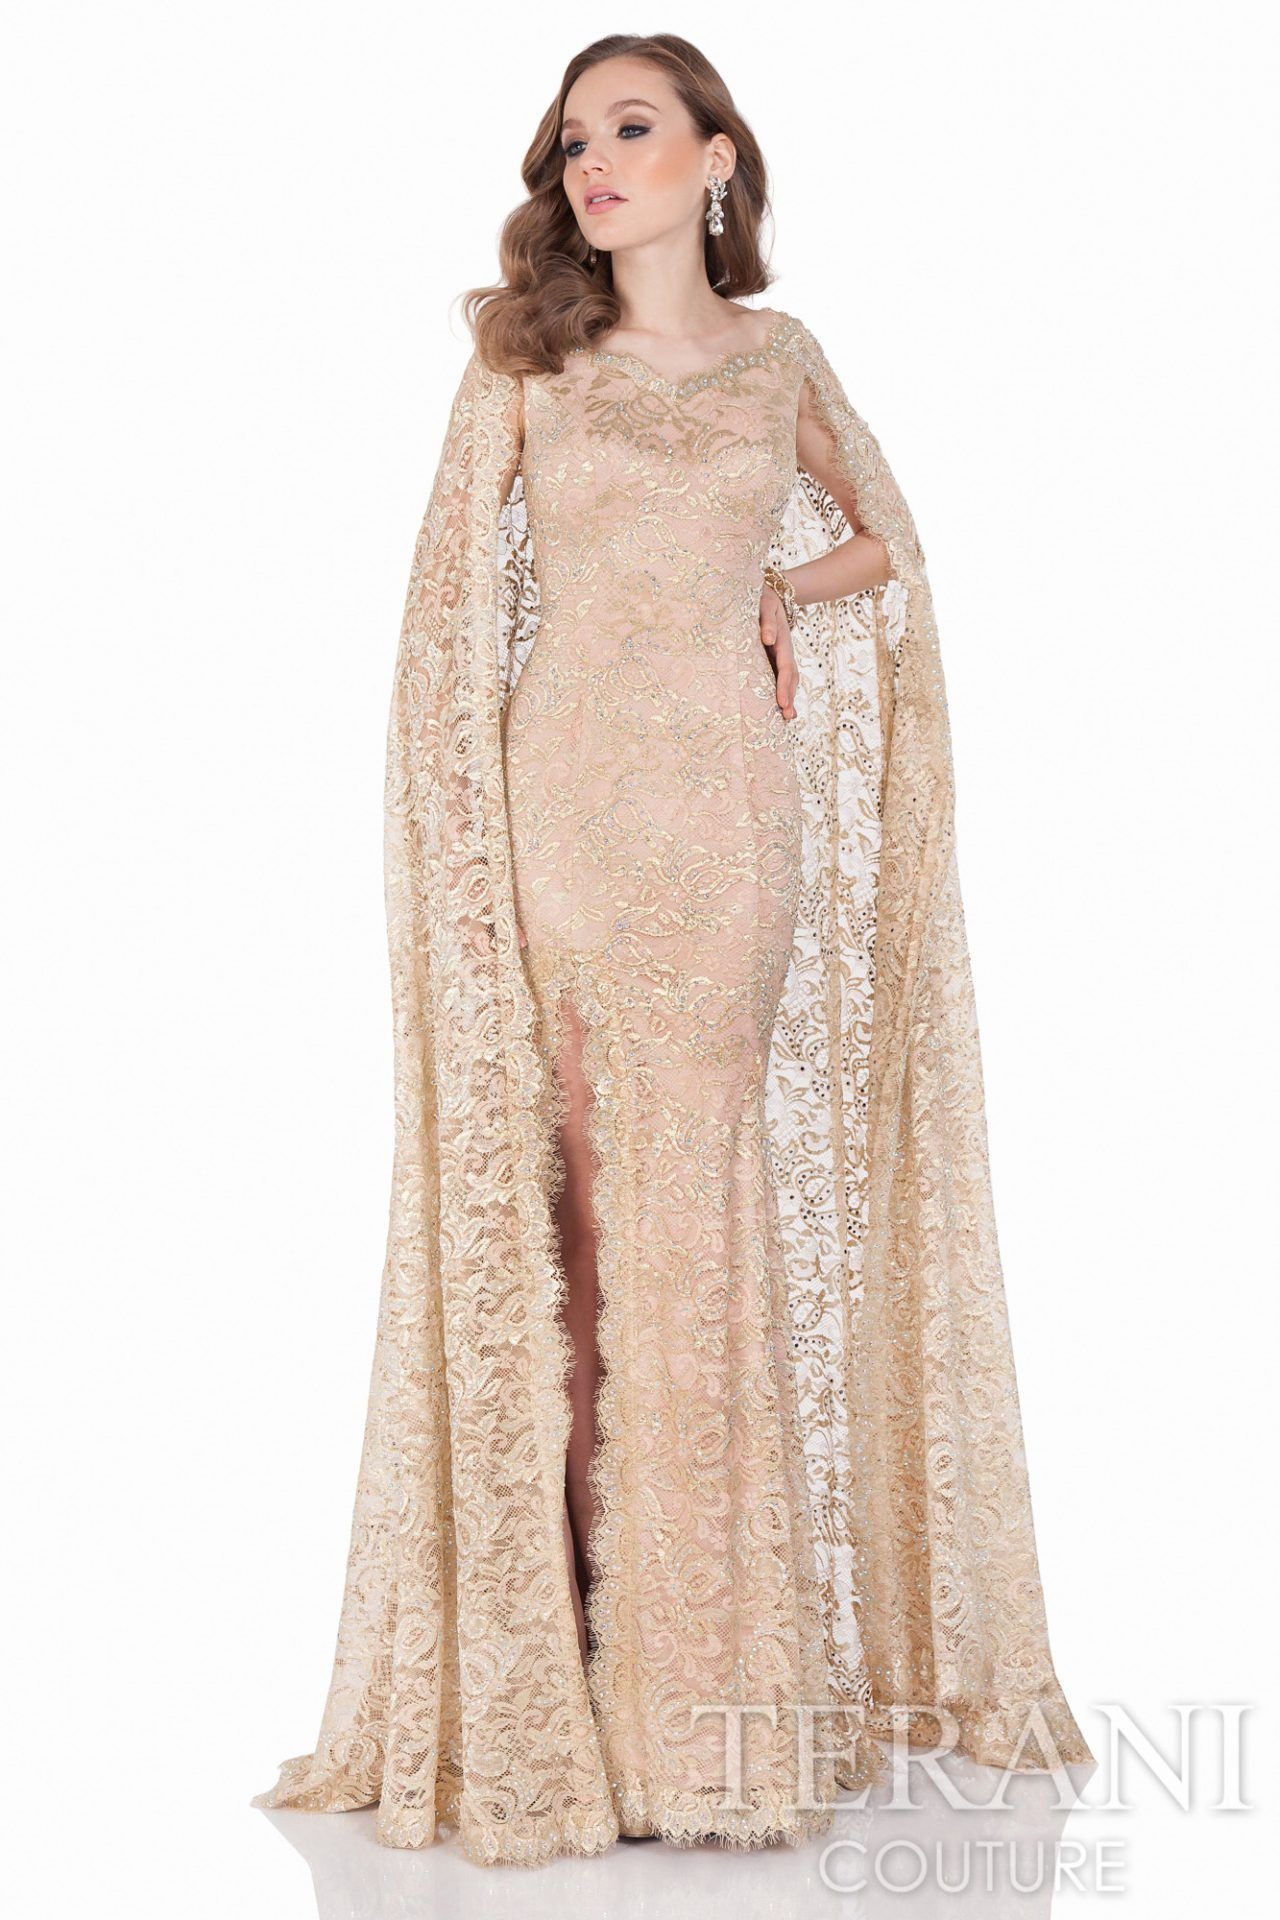 rochii de inchiriat - dantelata cu pelerina, ascunde parca regalul!